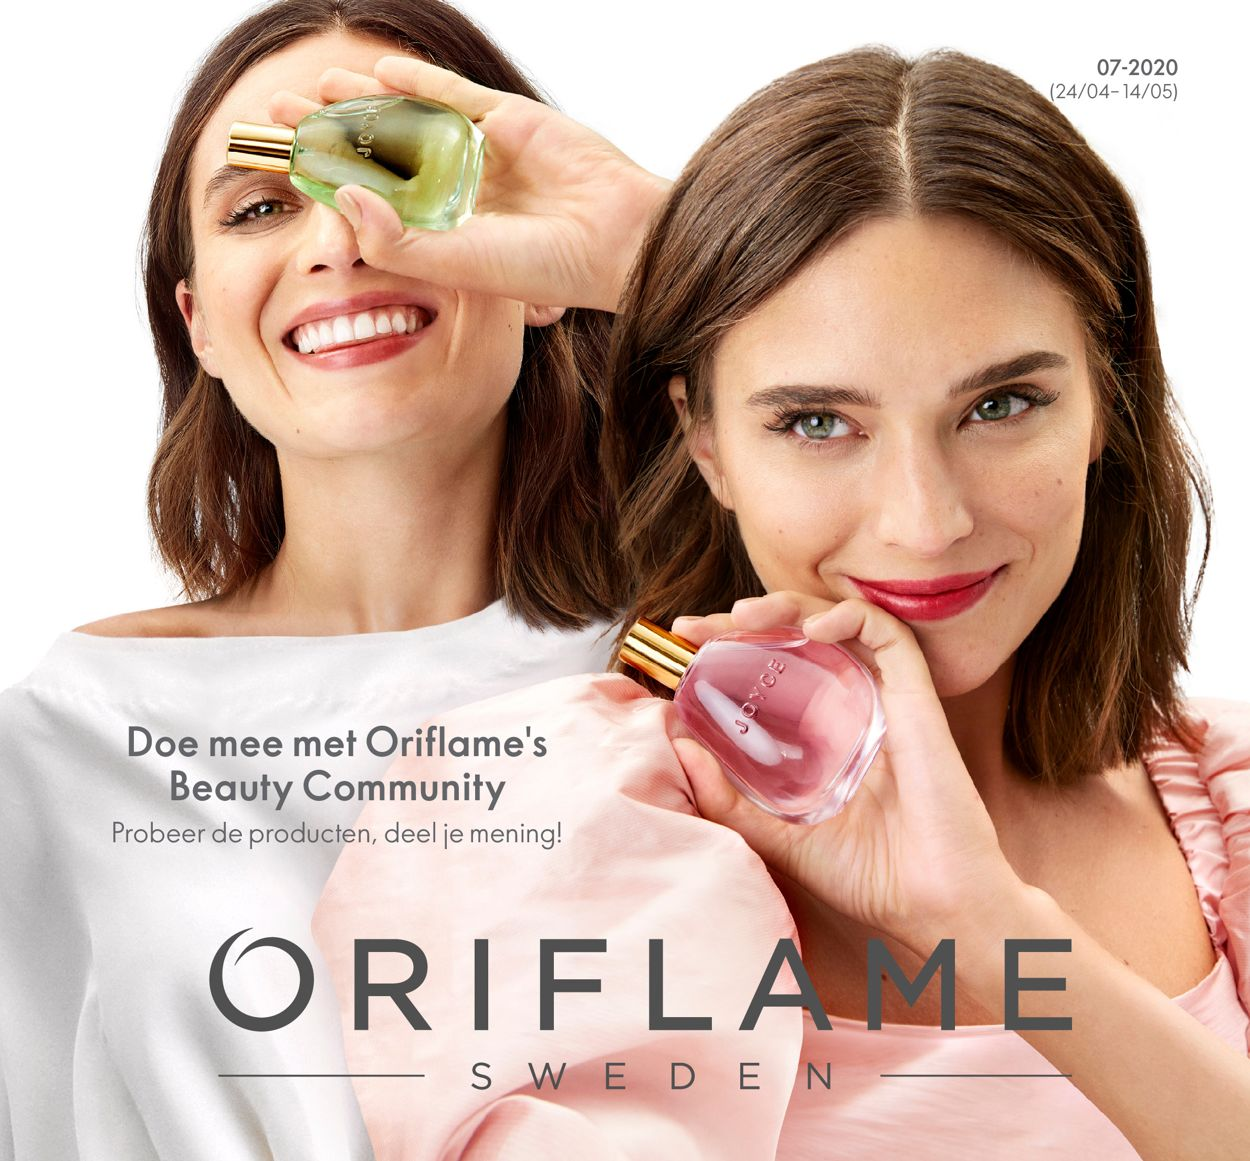 Oriflame Folder - 24.04-14.05.2020